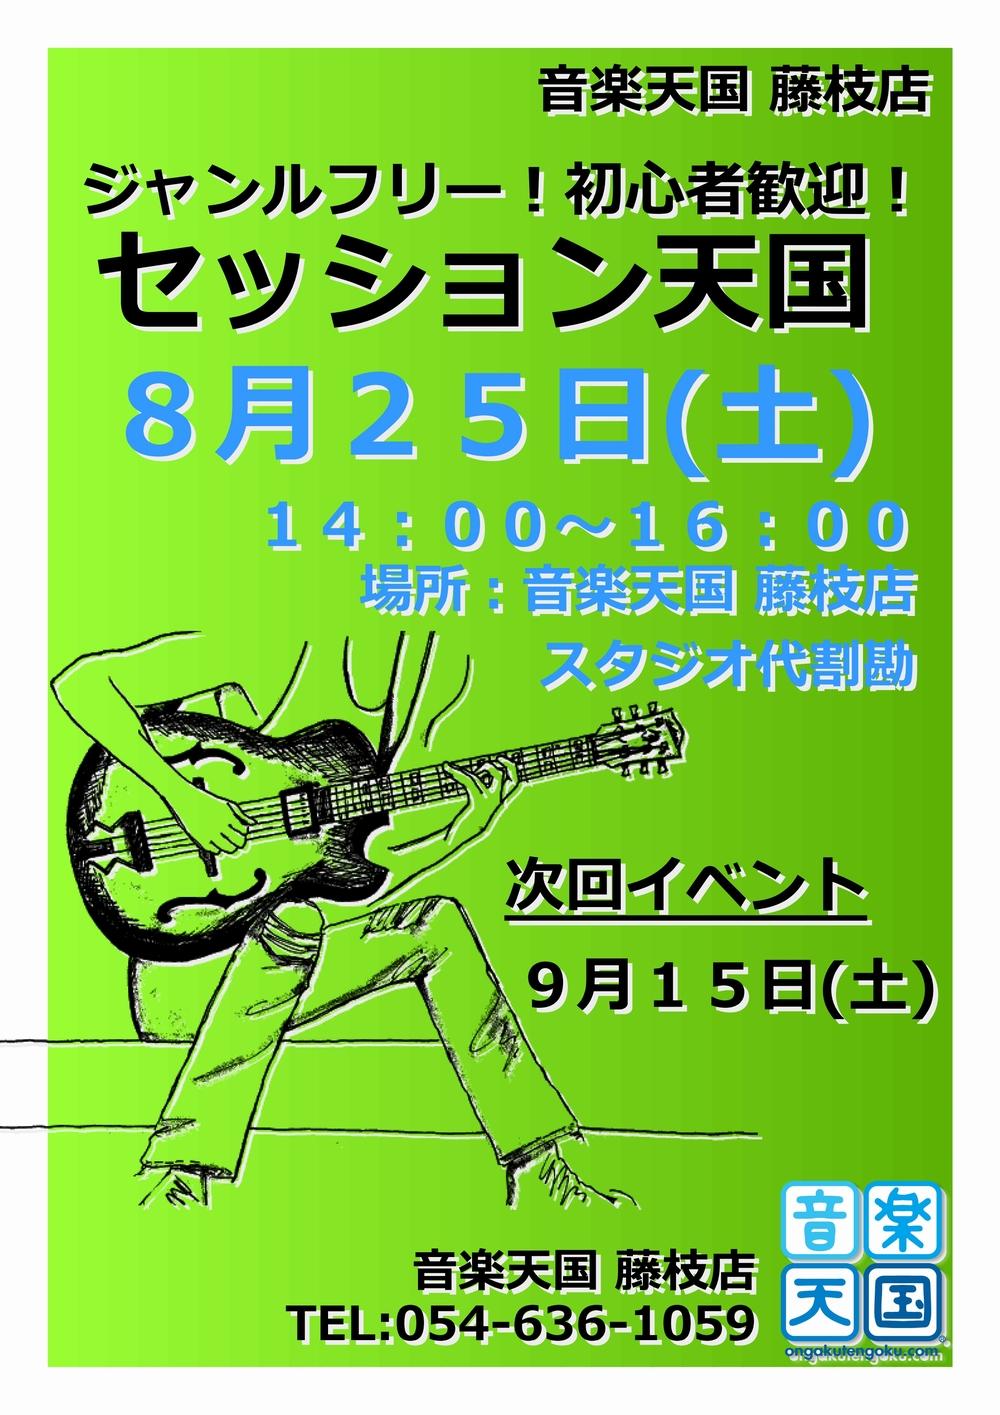 【セッション天国】音楽天国・藤枝店8月25日(土)開催